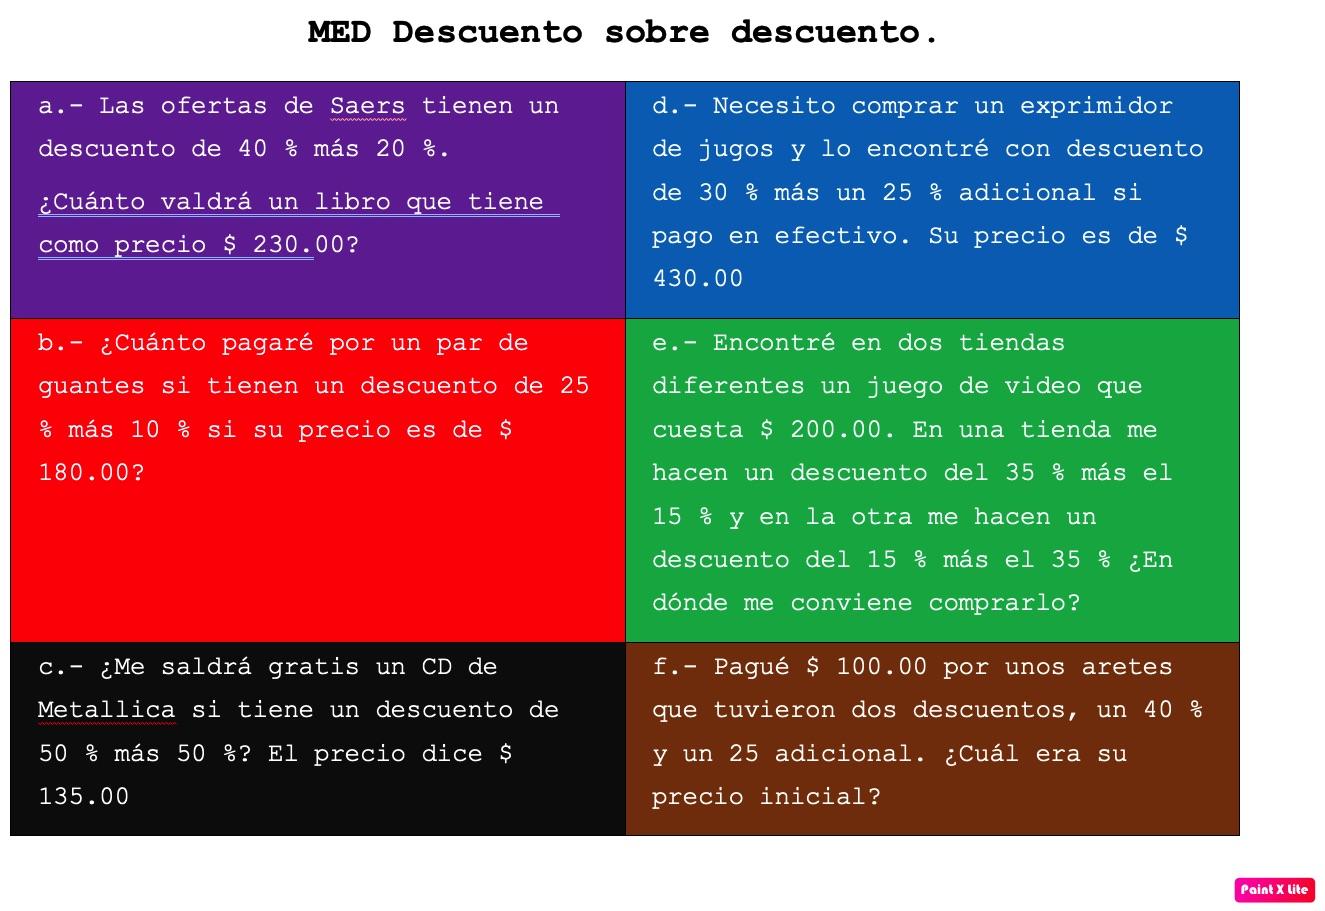 Descuento+sobre+descuento.jpg